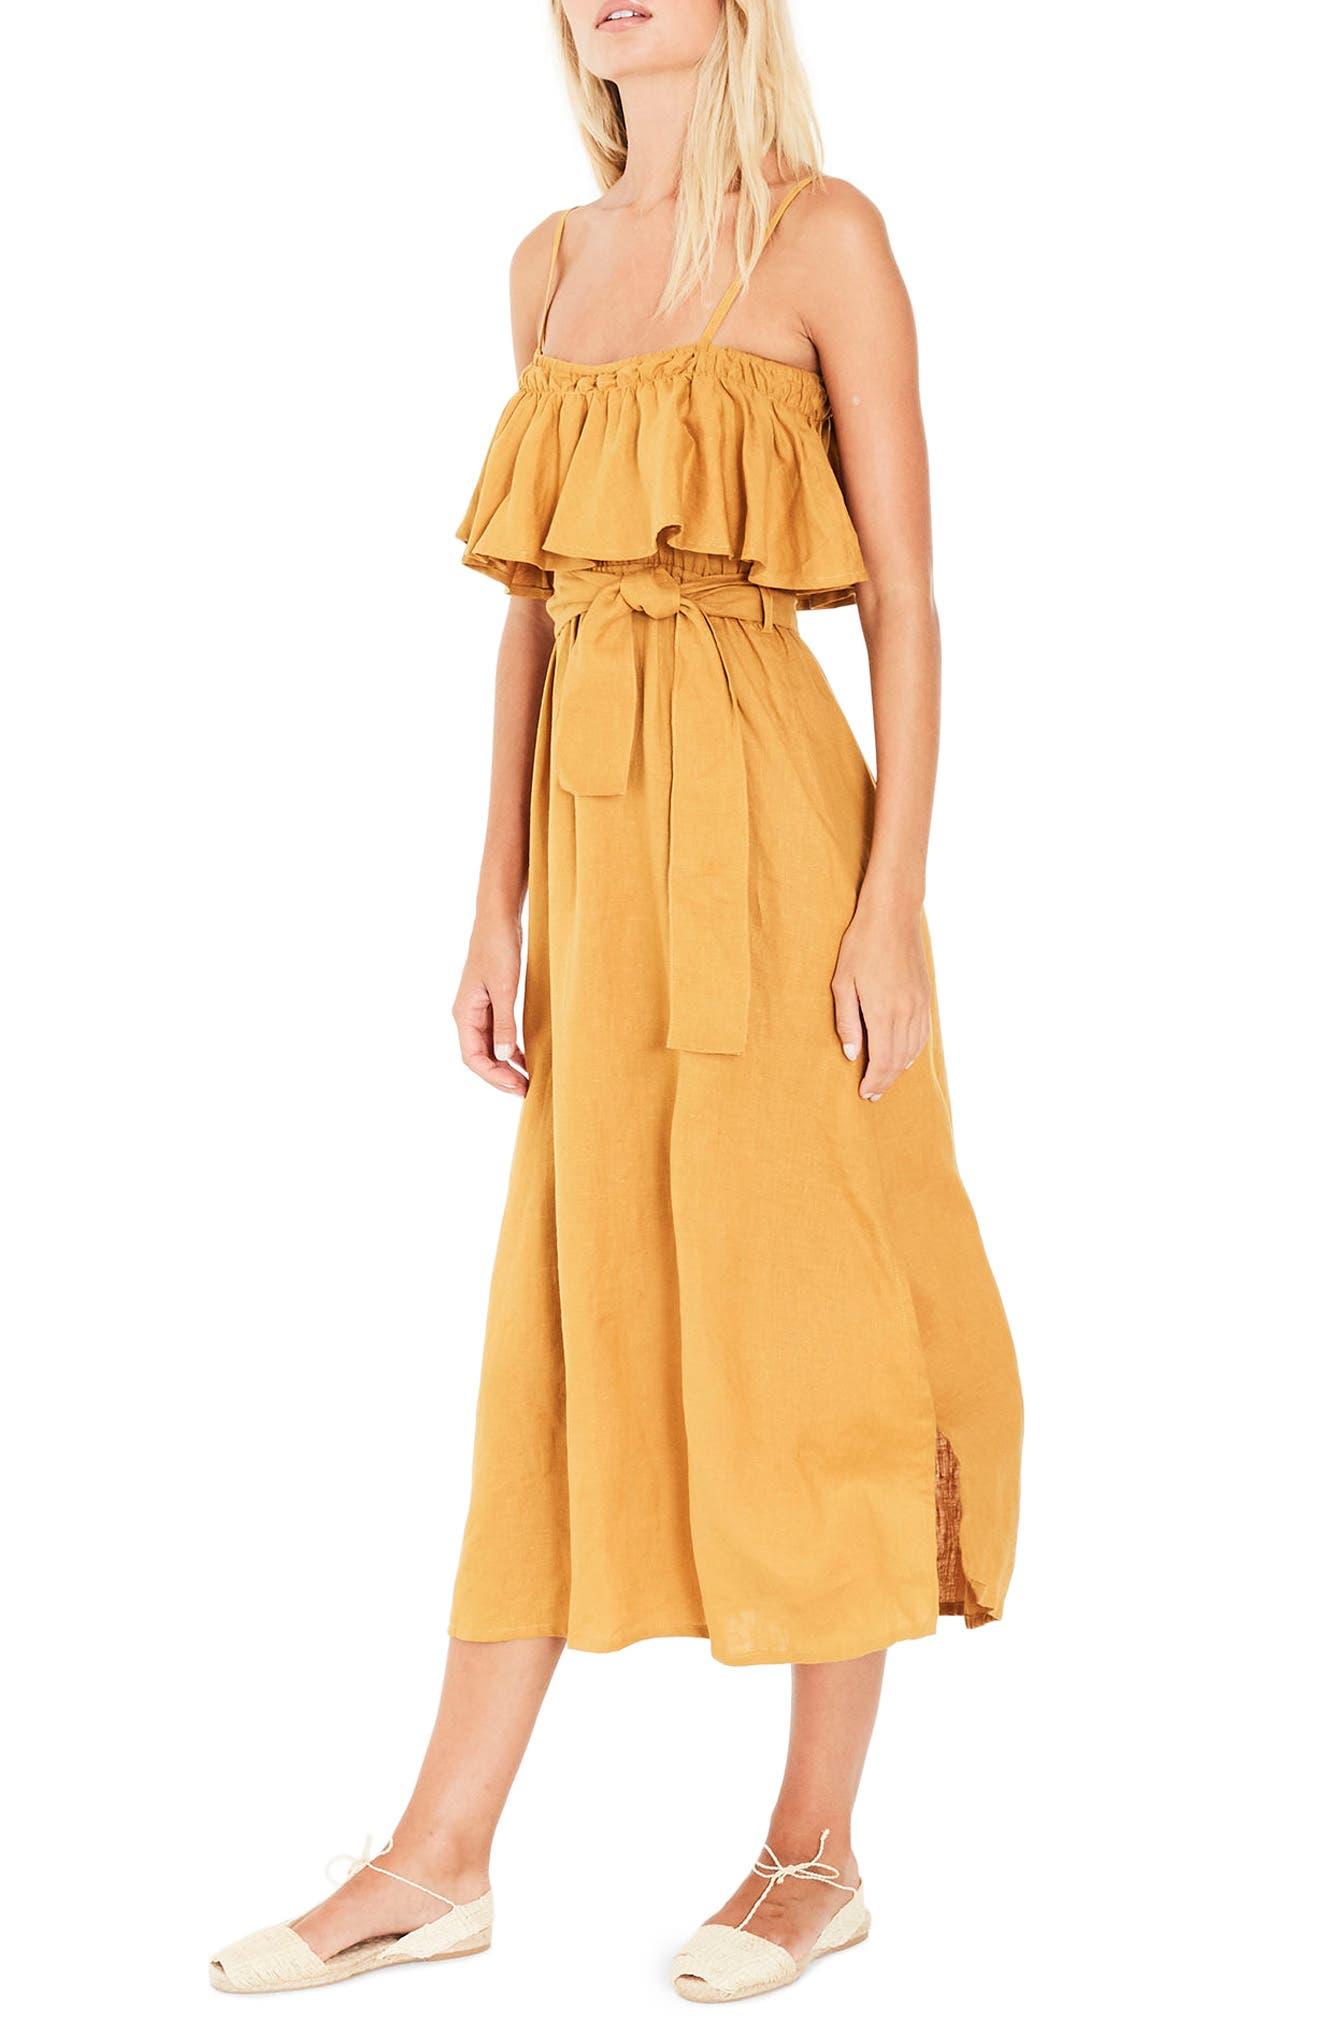 Santo Linen Midi Dress,                             Alternate thumbnail 4, color,                             Plain Marigold